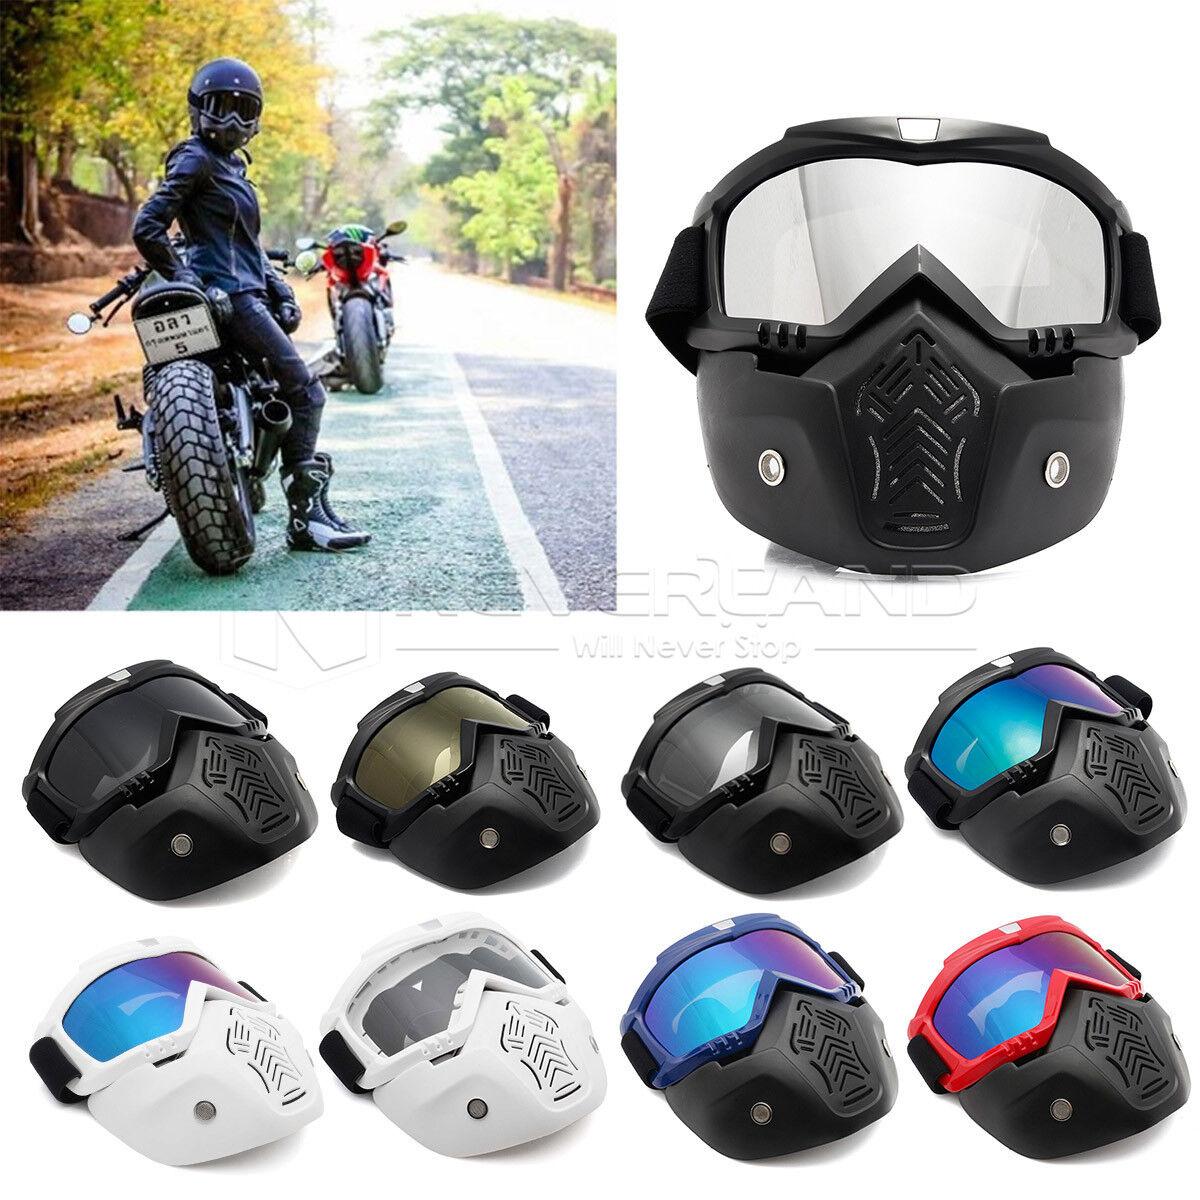 UV Len Flexible Goggles Glasses Face Mask Motorcycle Riding ATV Dirt Bike Safety